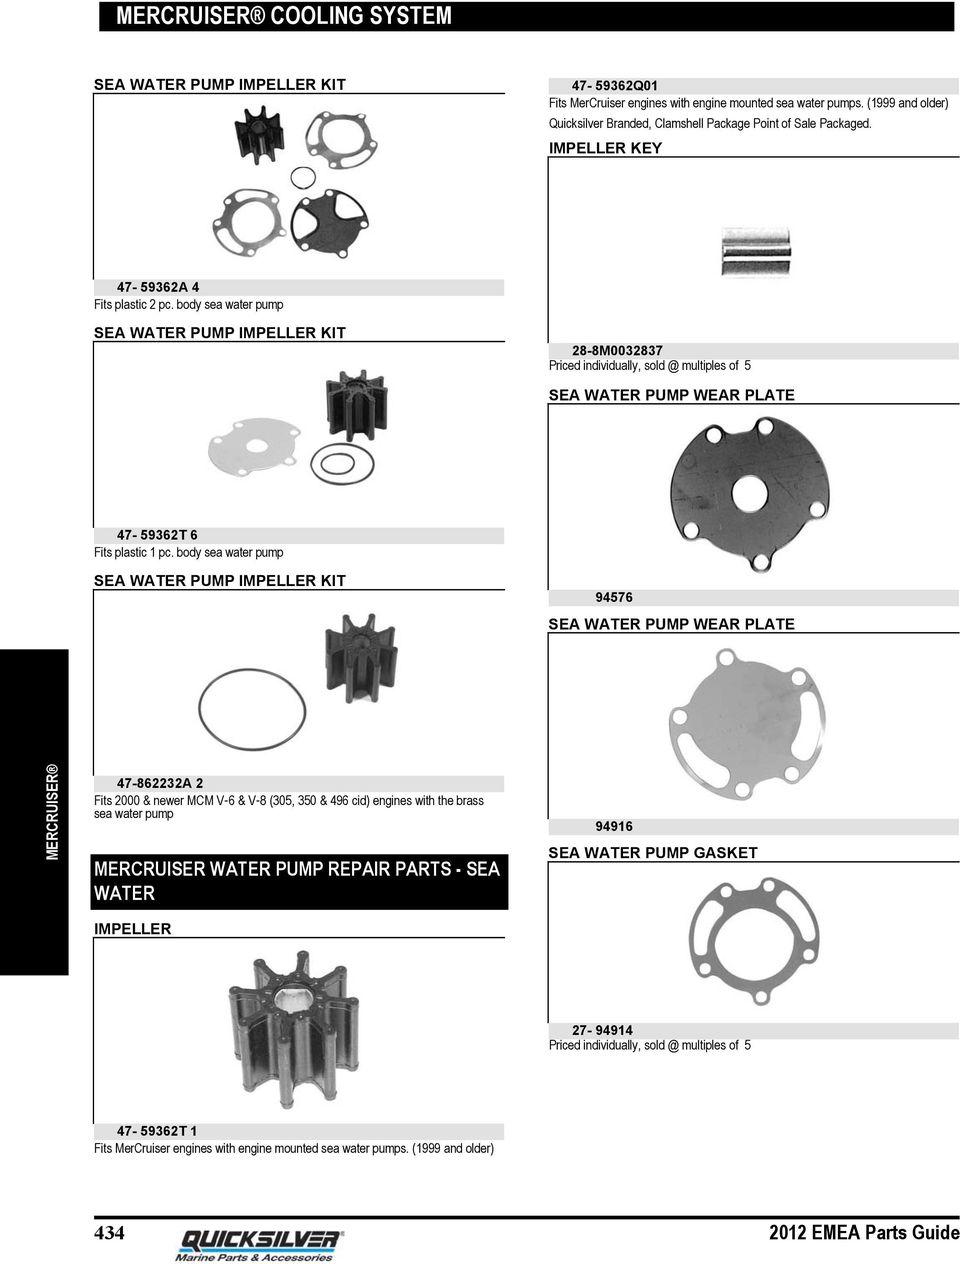 medium resolution of body sea water pump sea water pump impeller kit 28 8m0032837 priced individually sold